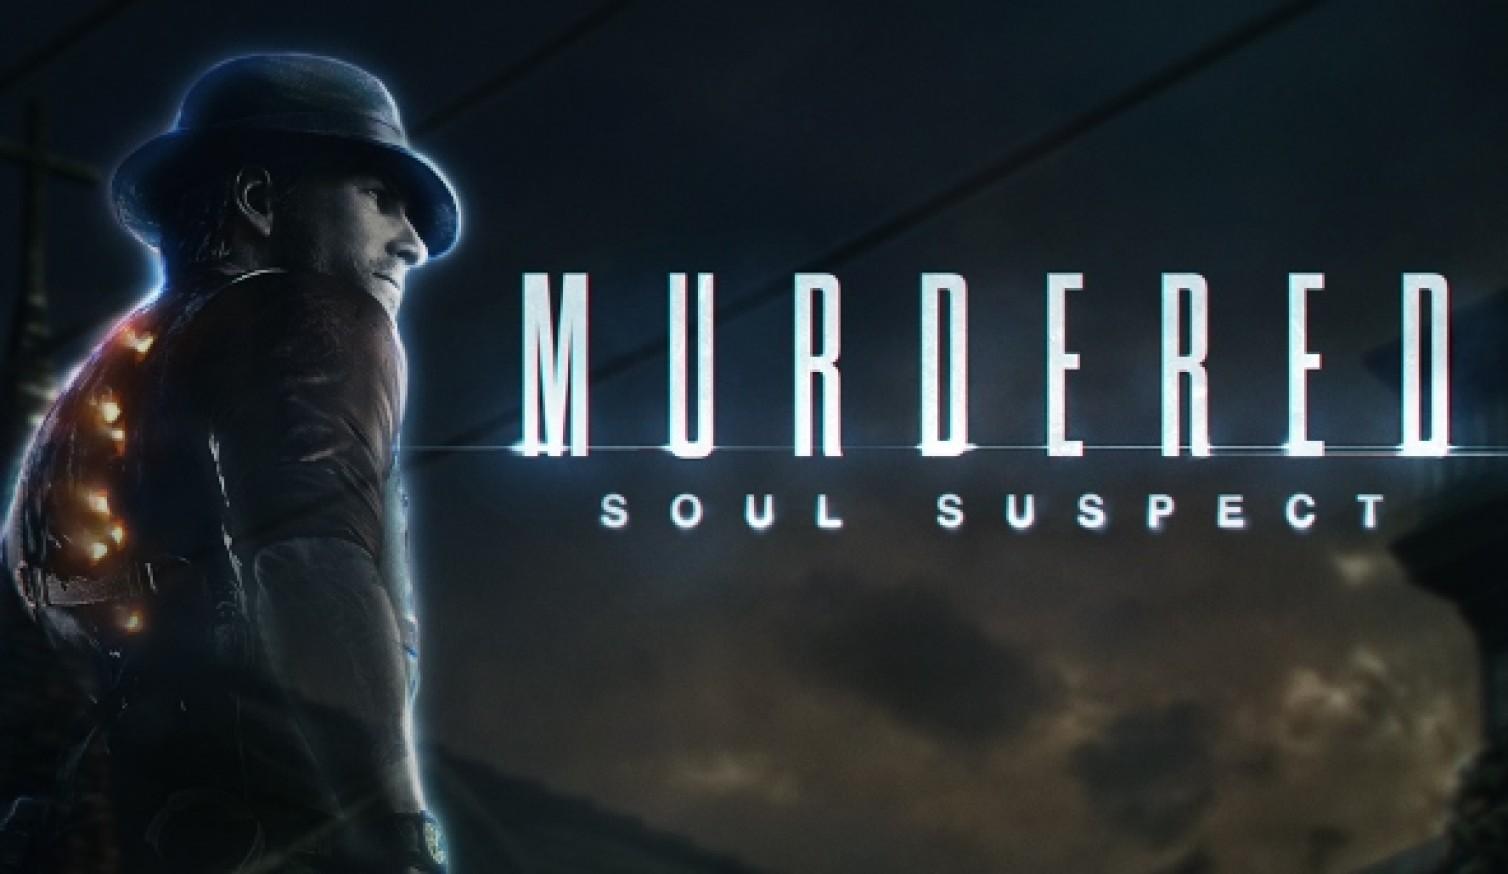 Murdered-soul-suspect-logo-1508x874_t